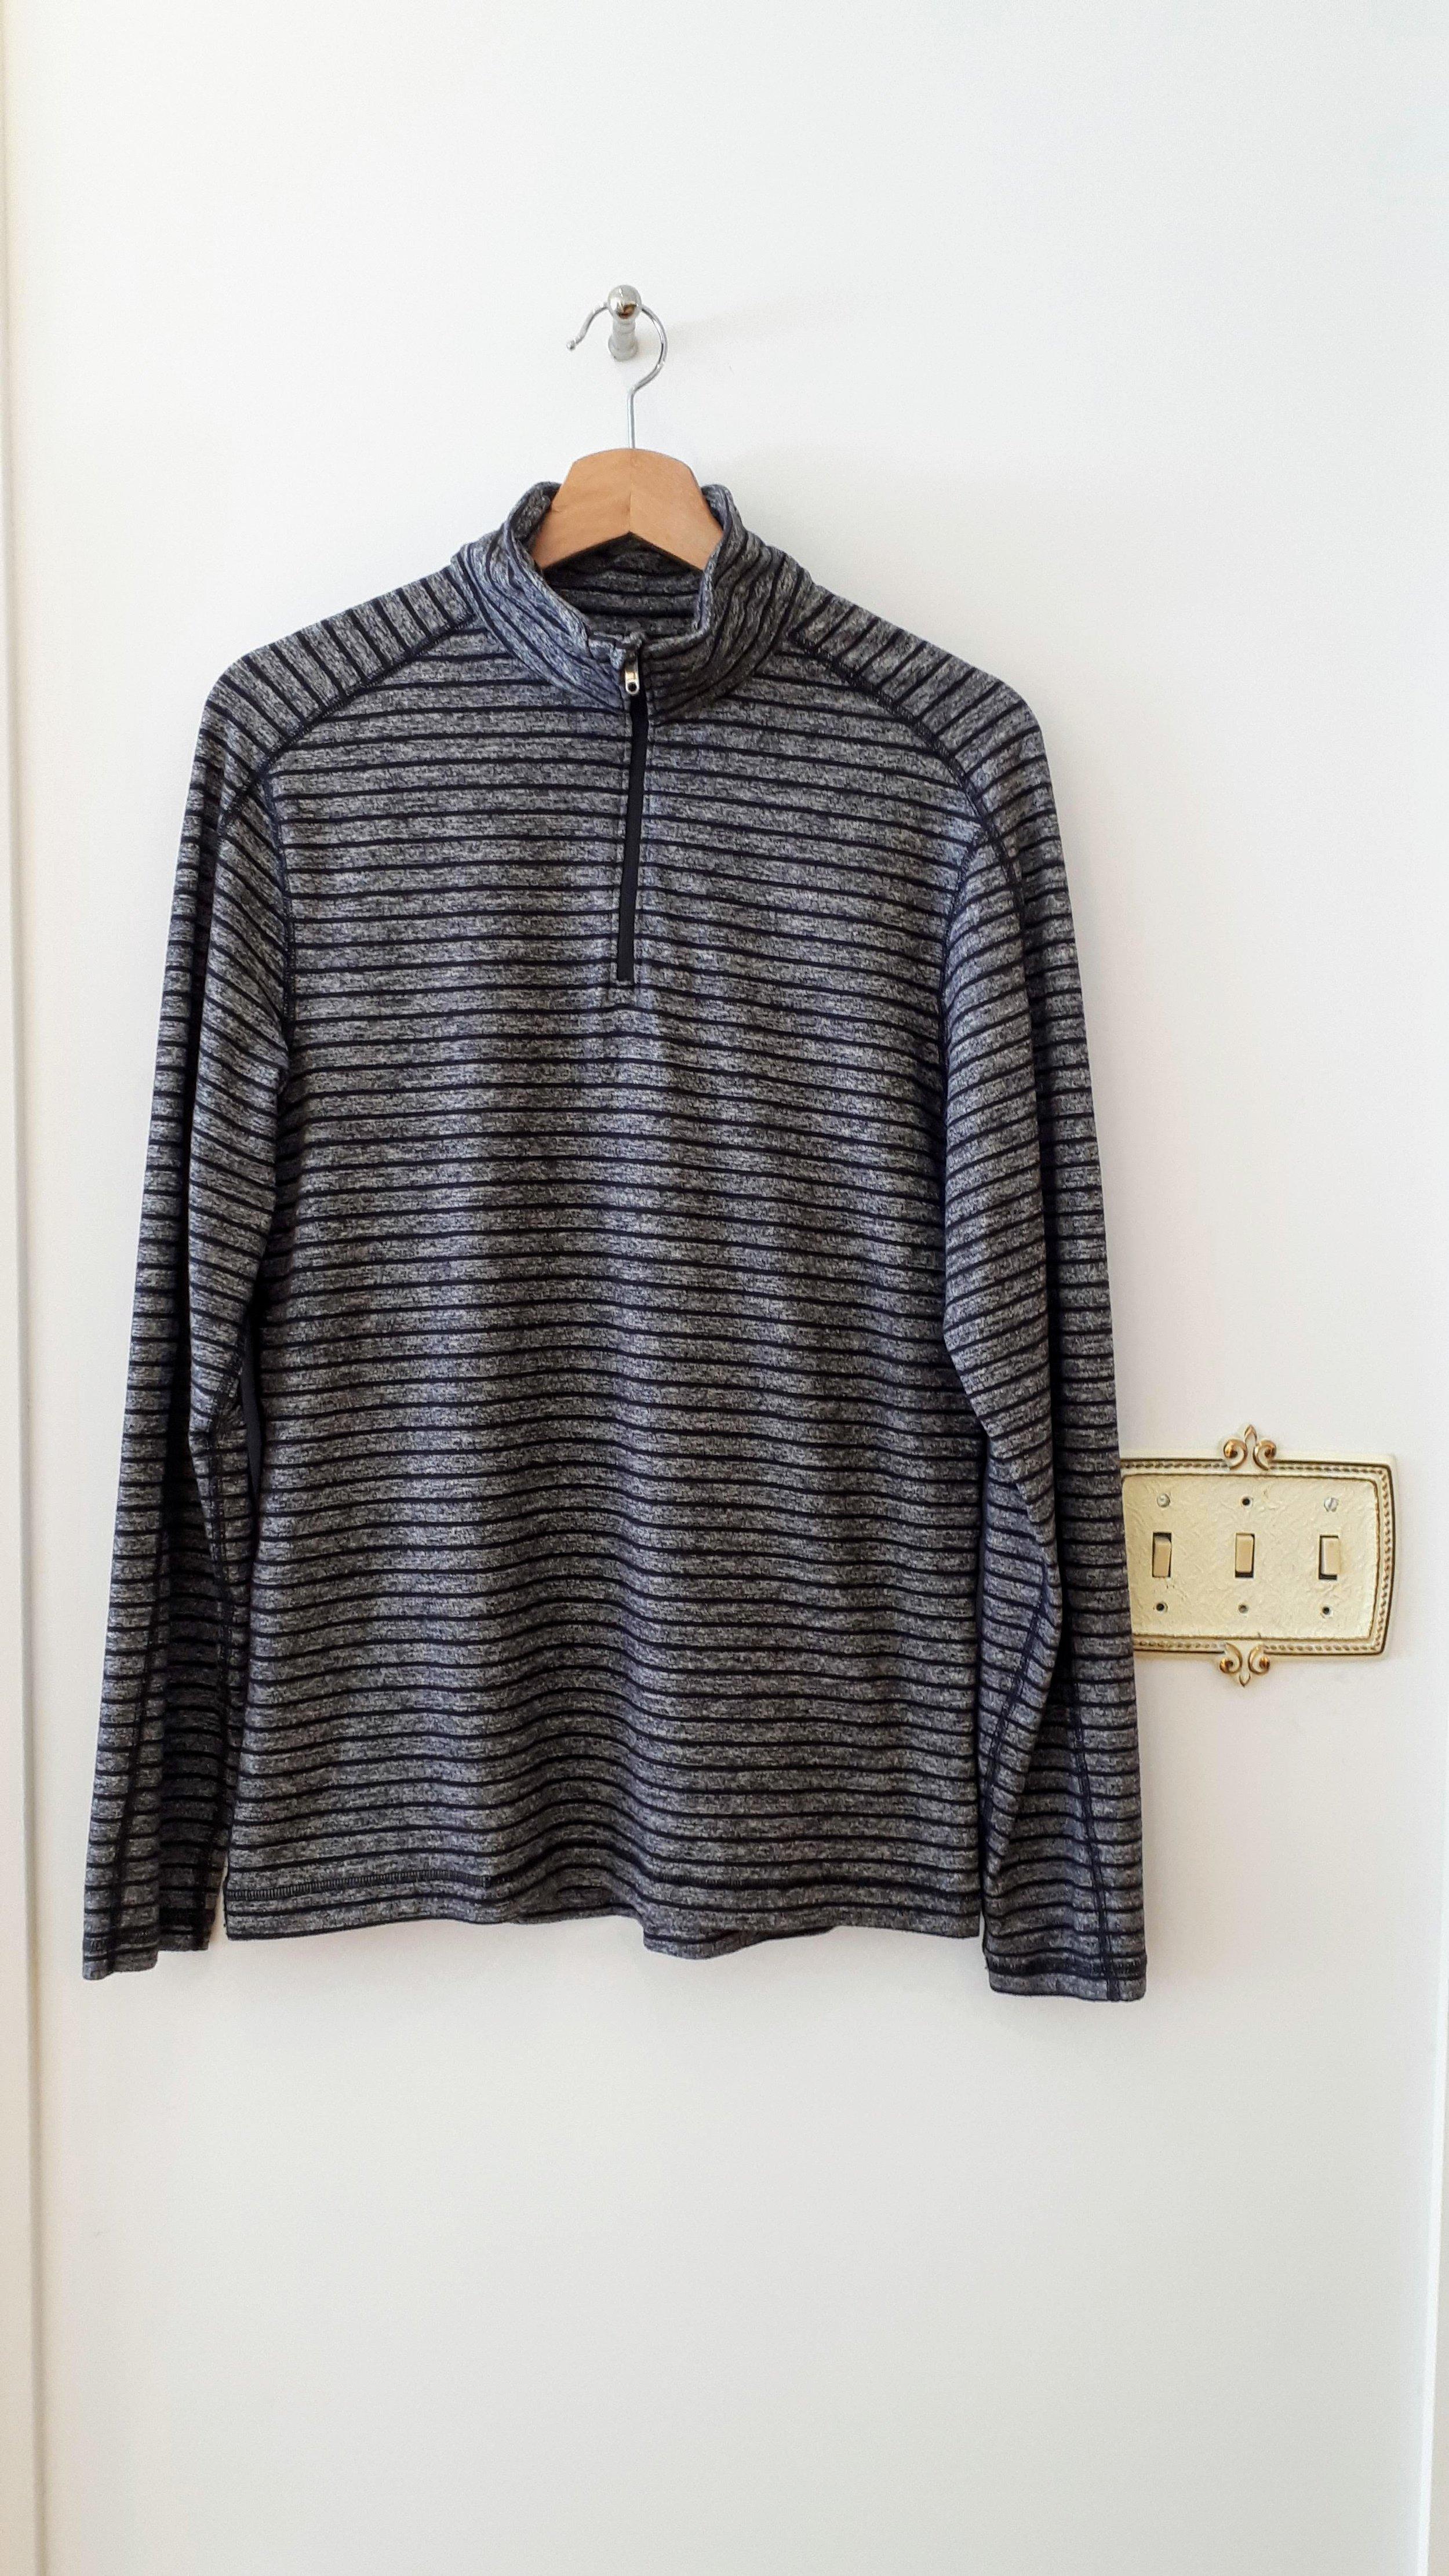 Lululemon mens top; Size M, $38